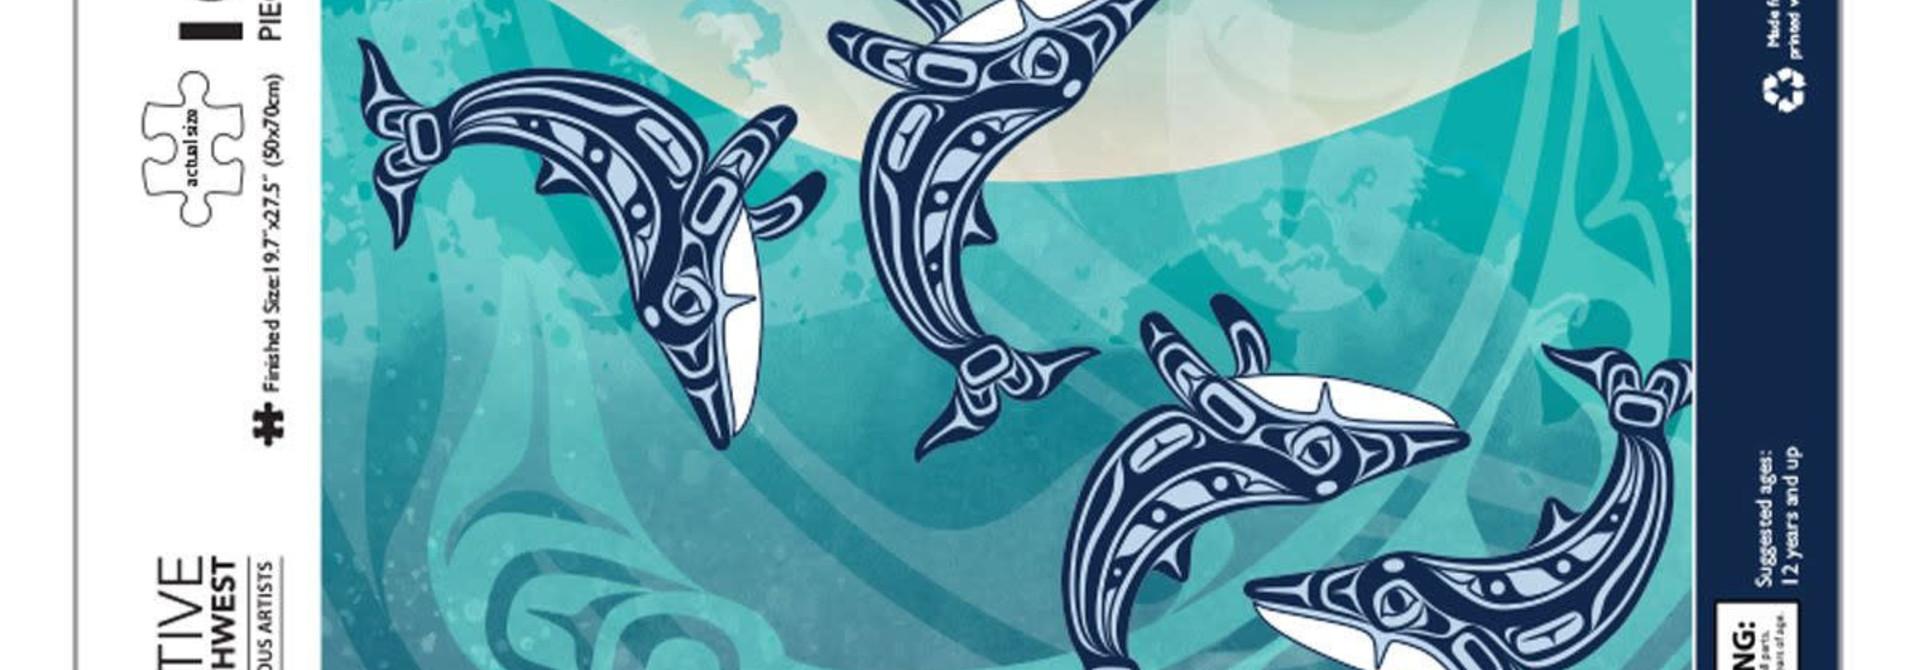 1000 pcs Puzzle - Humpback Whale by Gordon White